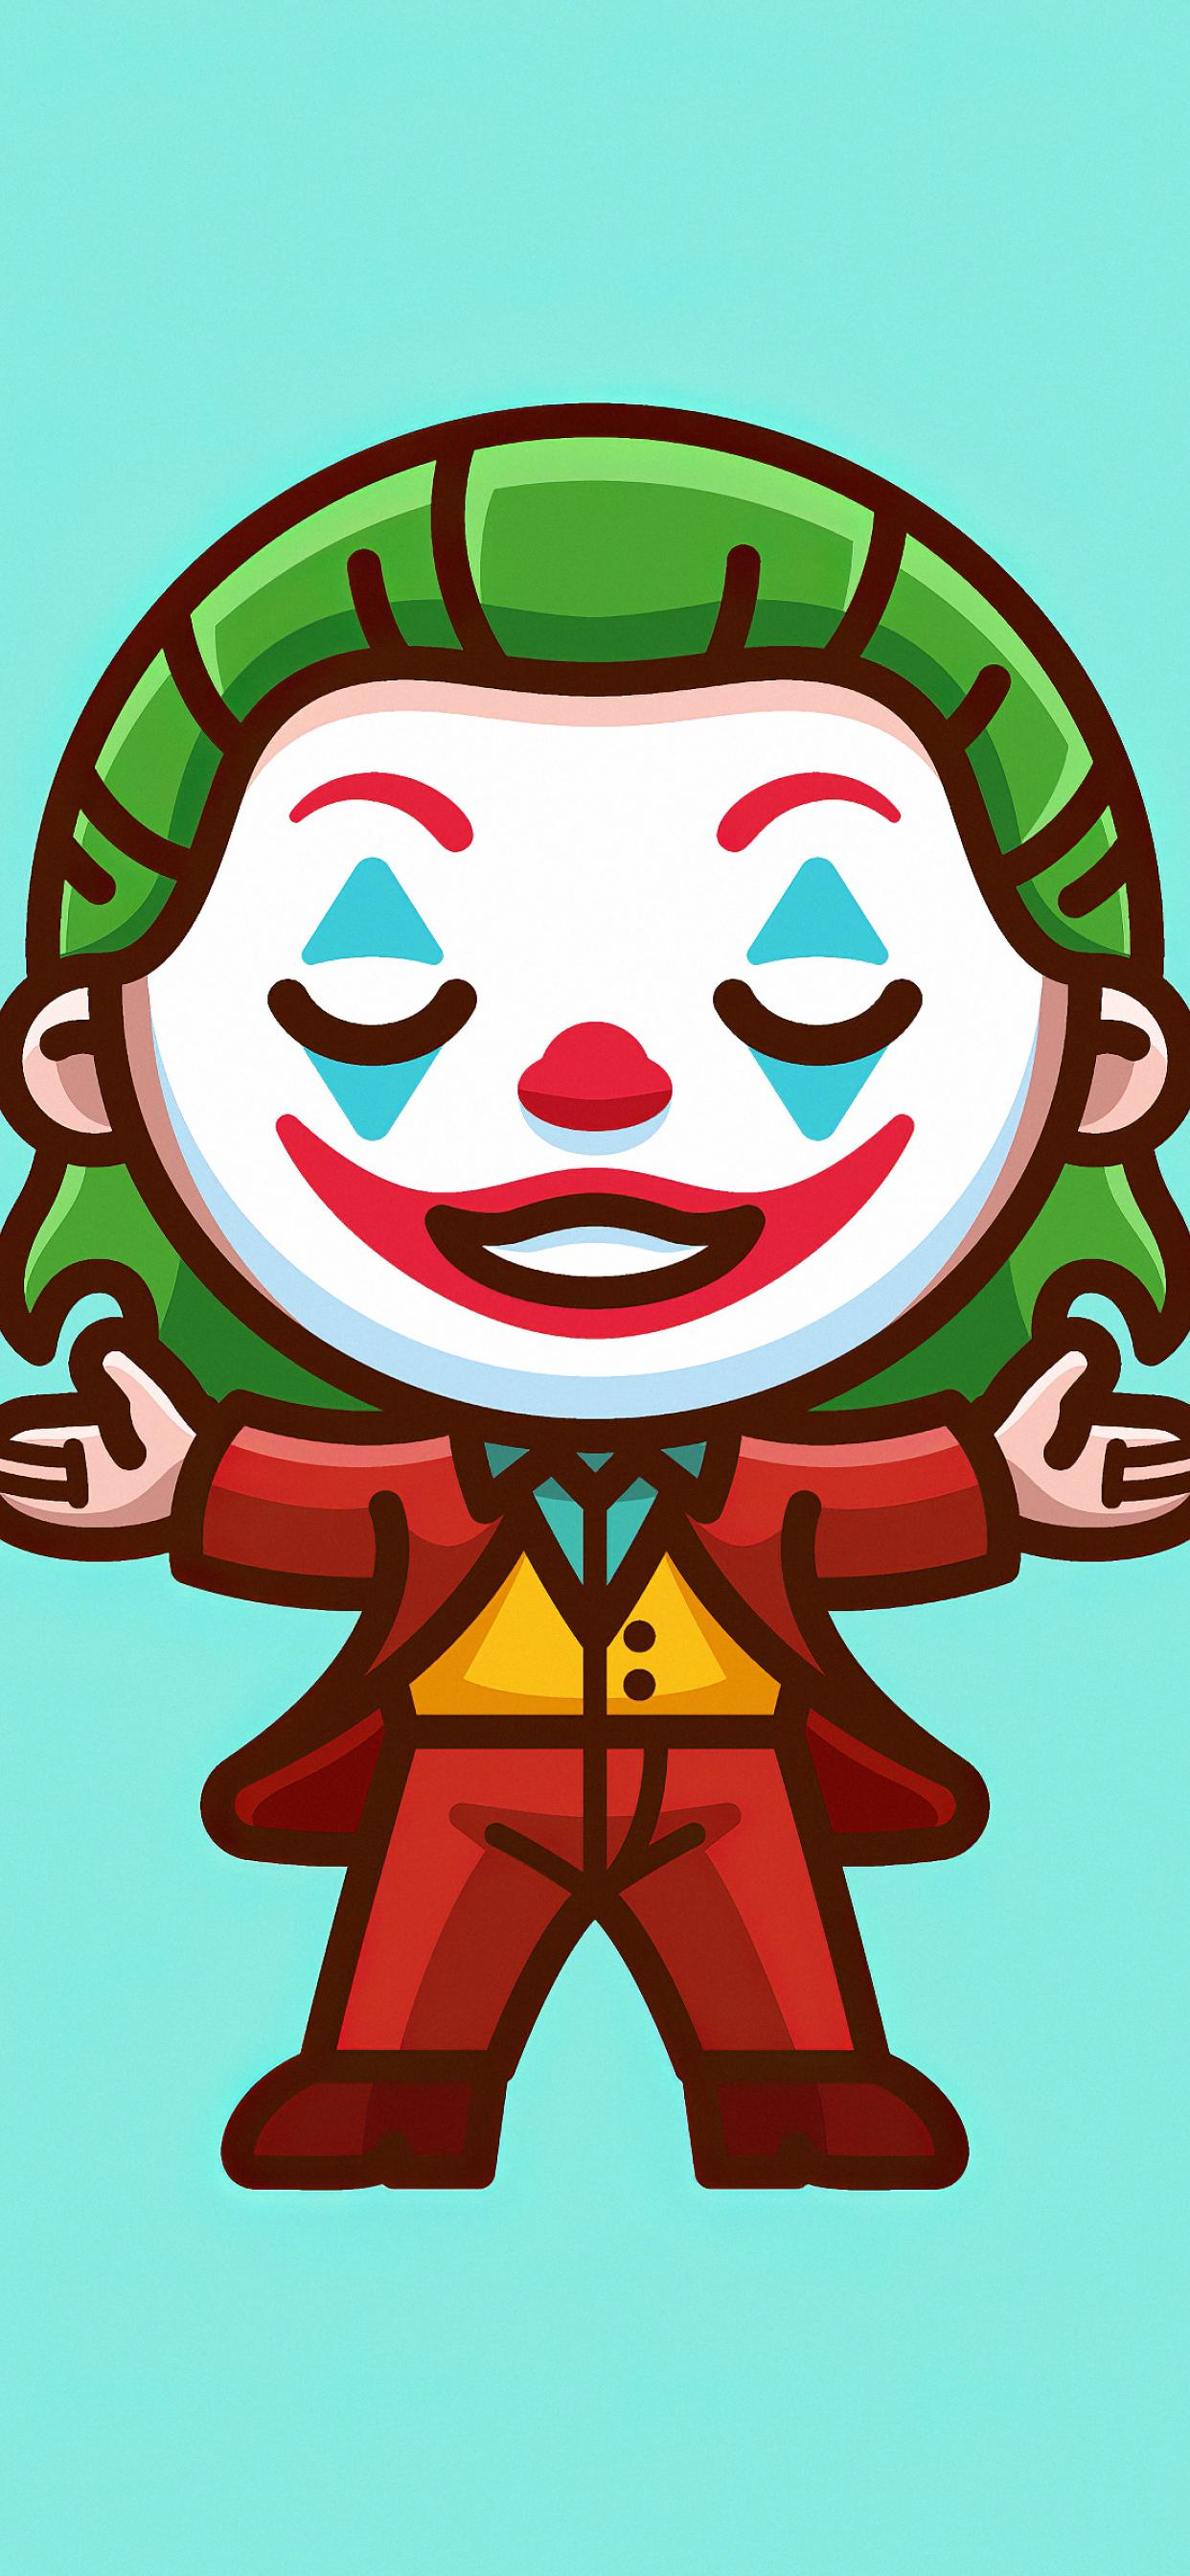 1242x2688 Artwork Joker 2020 Iphone XS MAX Wallpaper HD